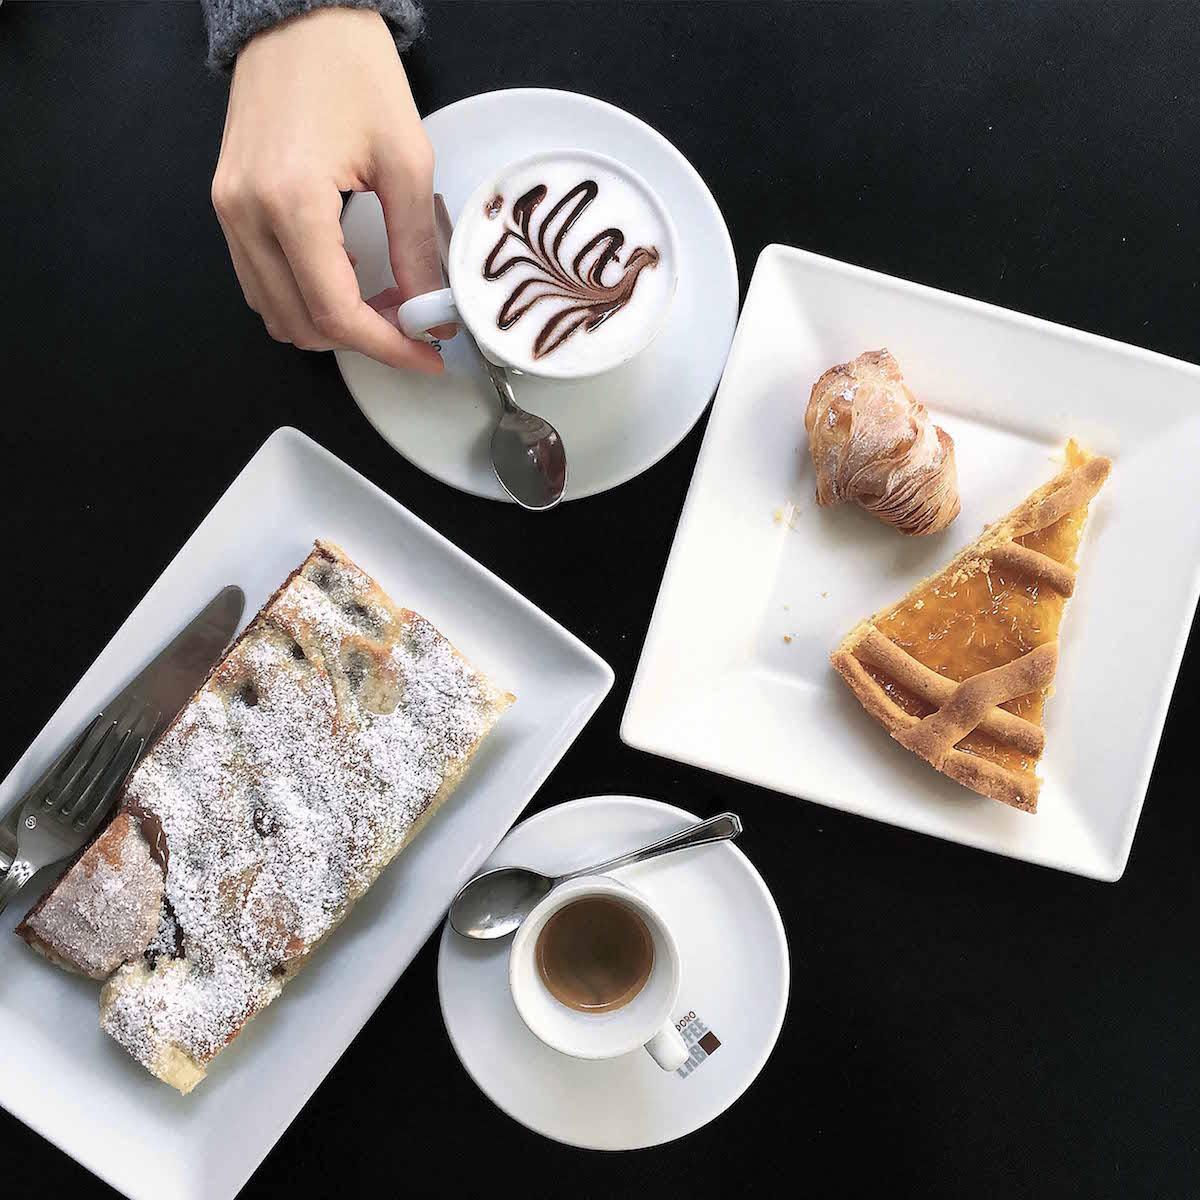 baked-goods-for-best-breakfast-in-La-Spezia-1.jpg